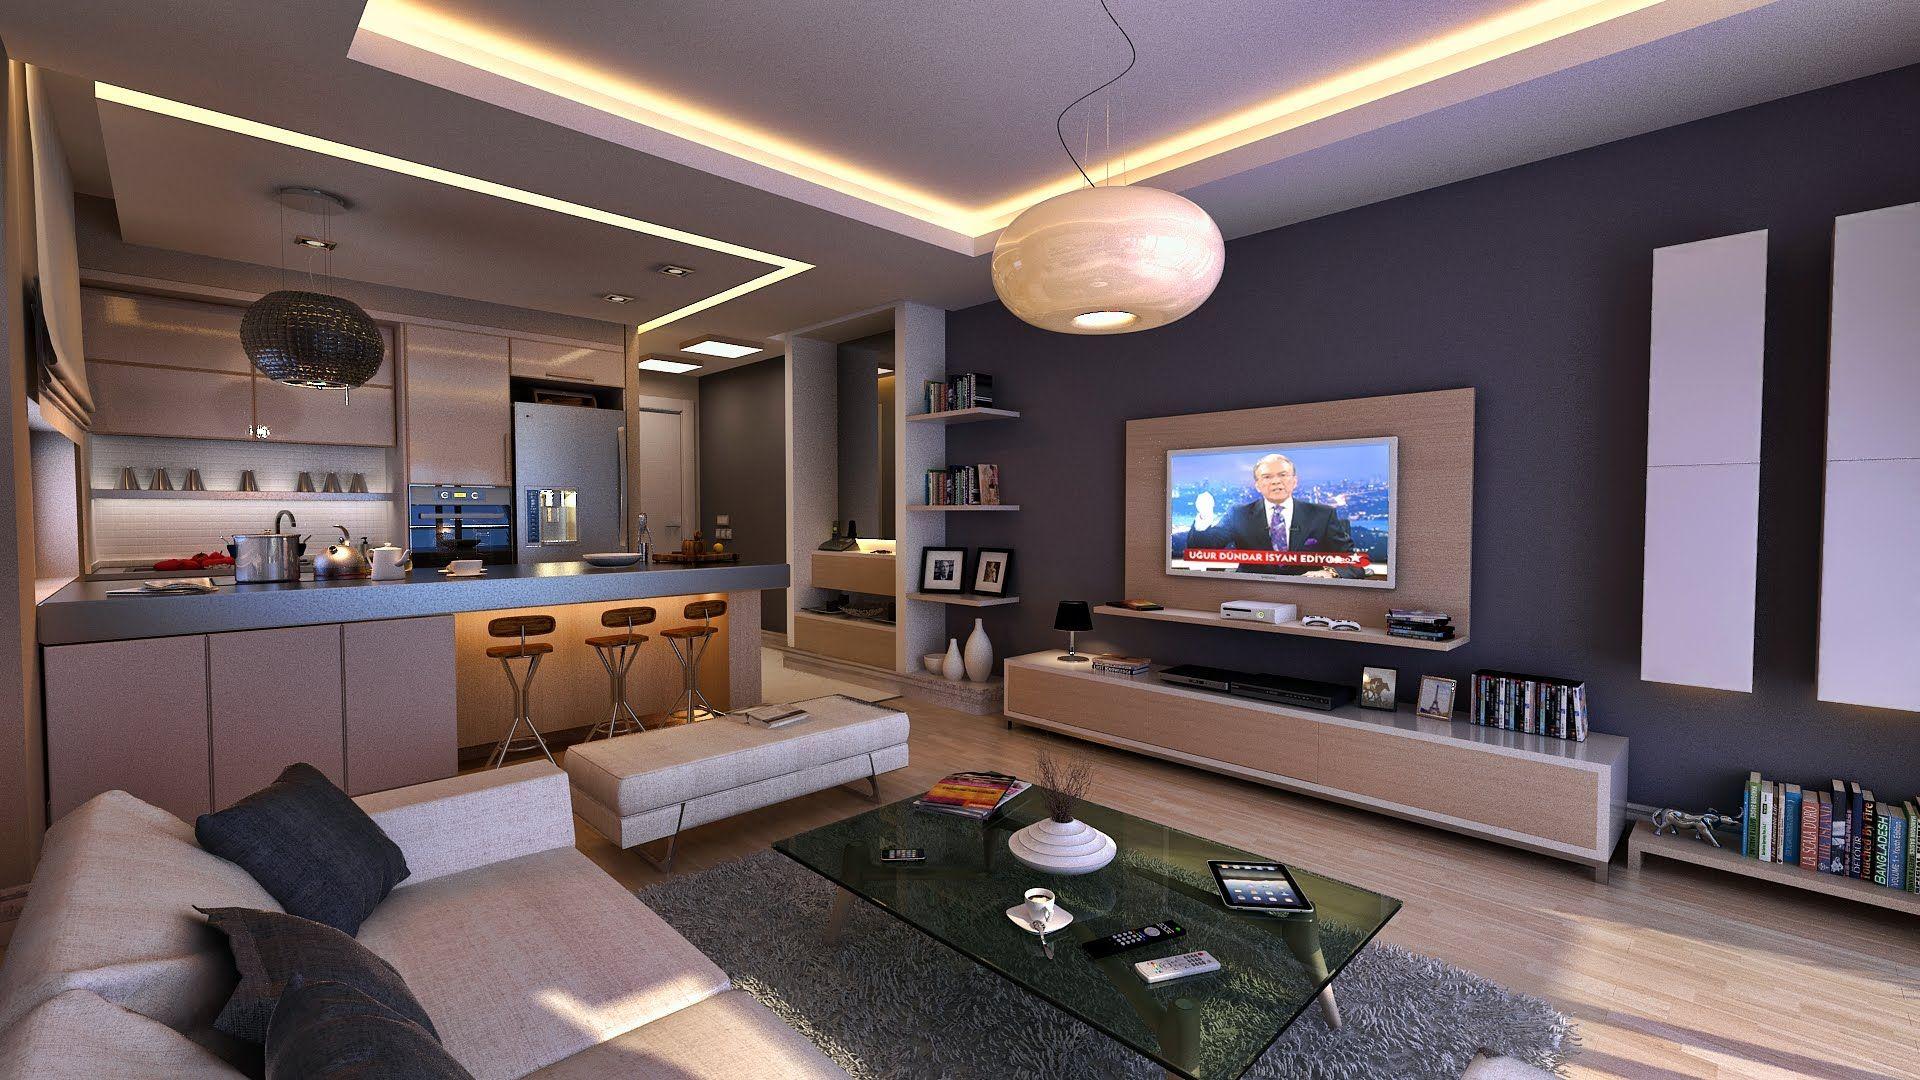 Image result for modern apartment design ideas | МК | Pinterest ...